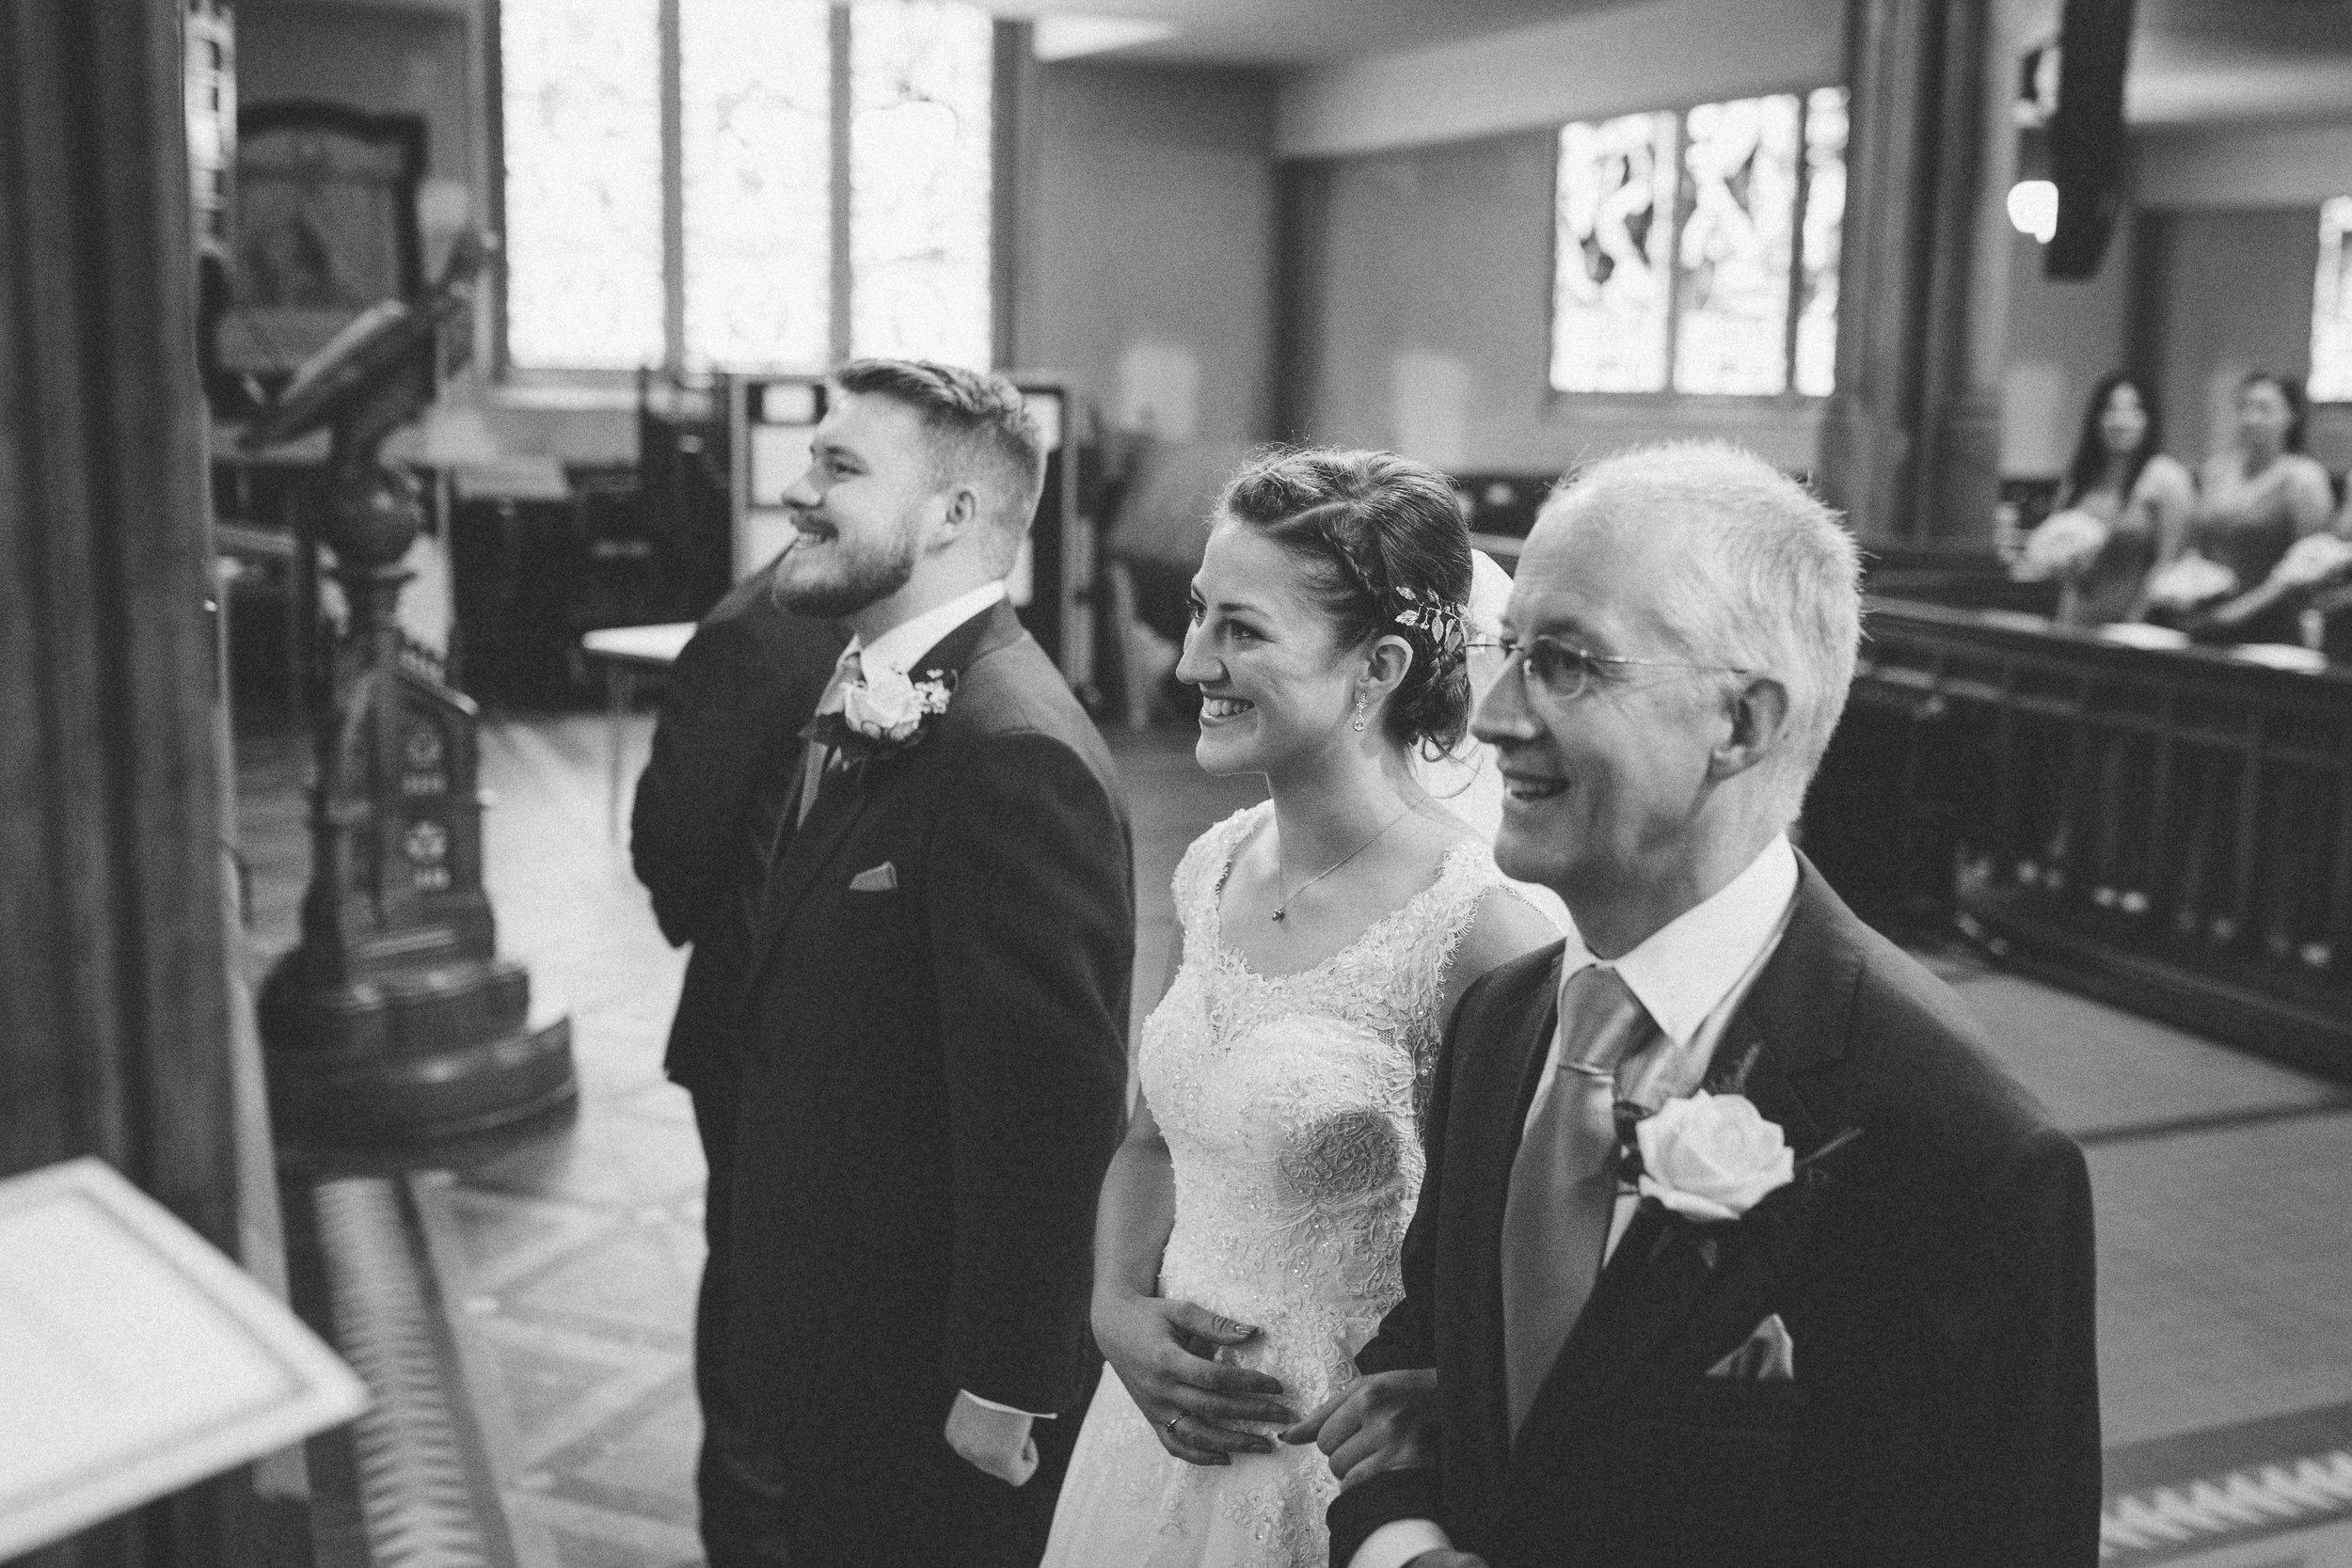 Kathryn-and-Mike-Wedding-Highlights-21.jpg